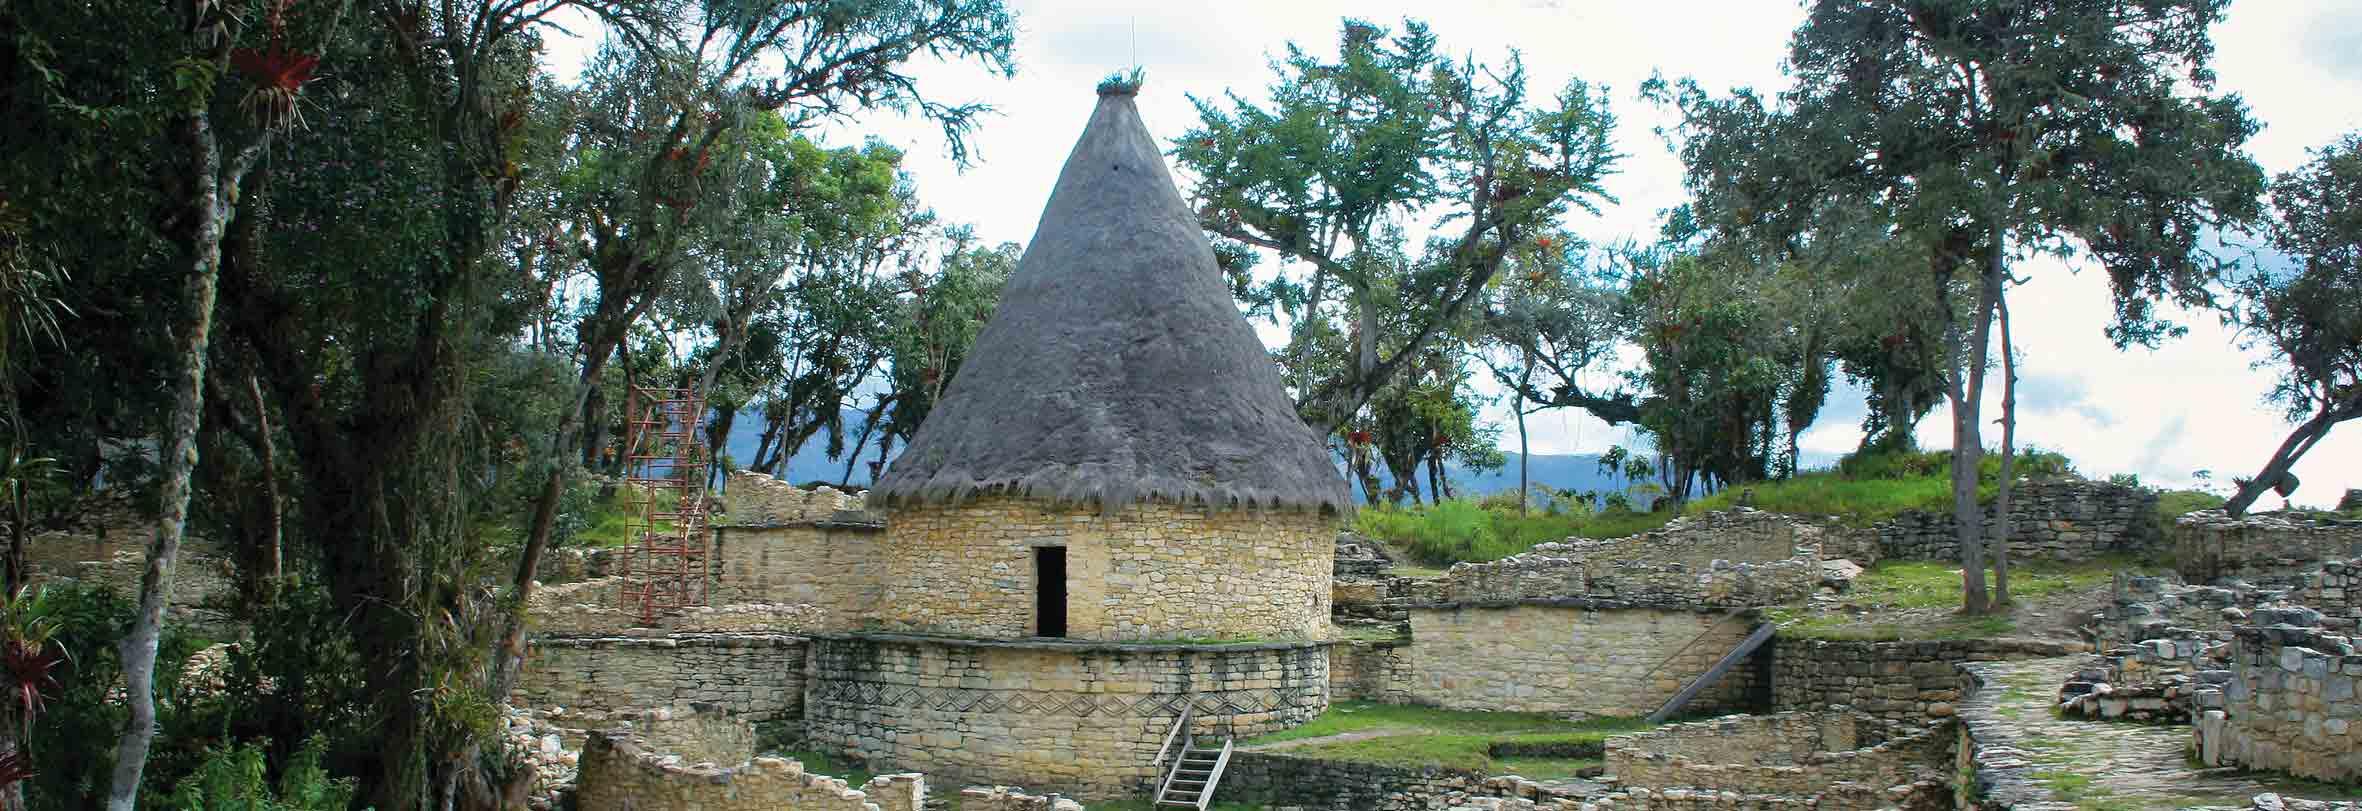 Chachapoya-Kultur, Peru